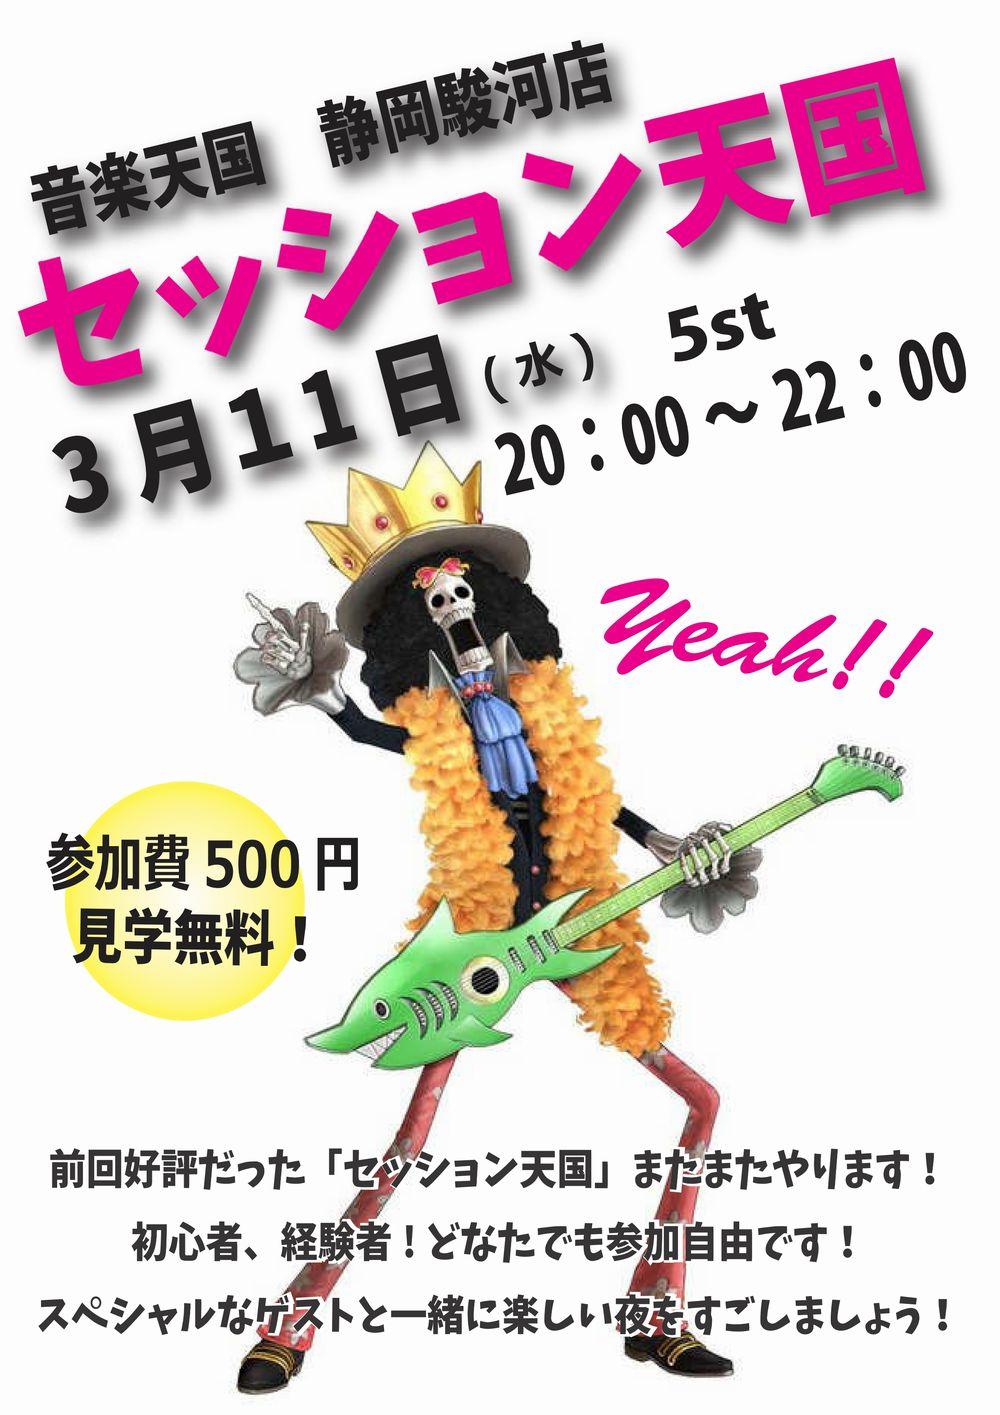 【セッション天国】@音楽天国・静岡駿河店3月11日(水)開催!